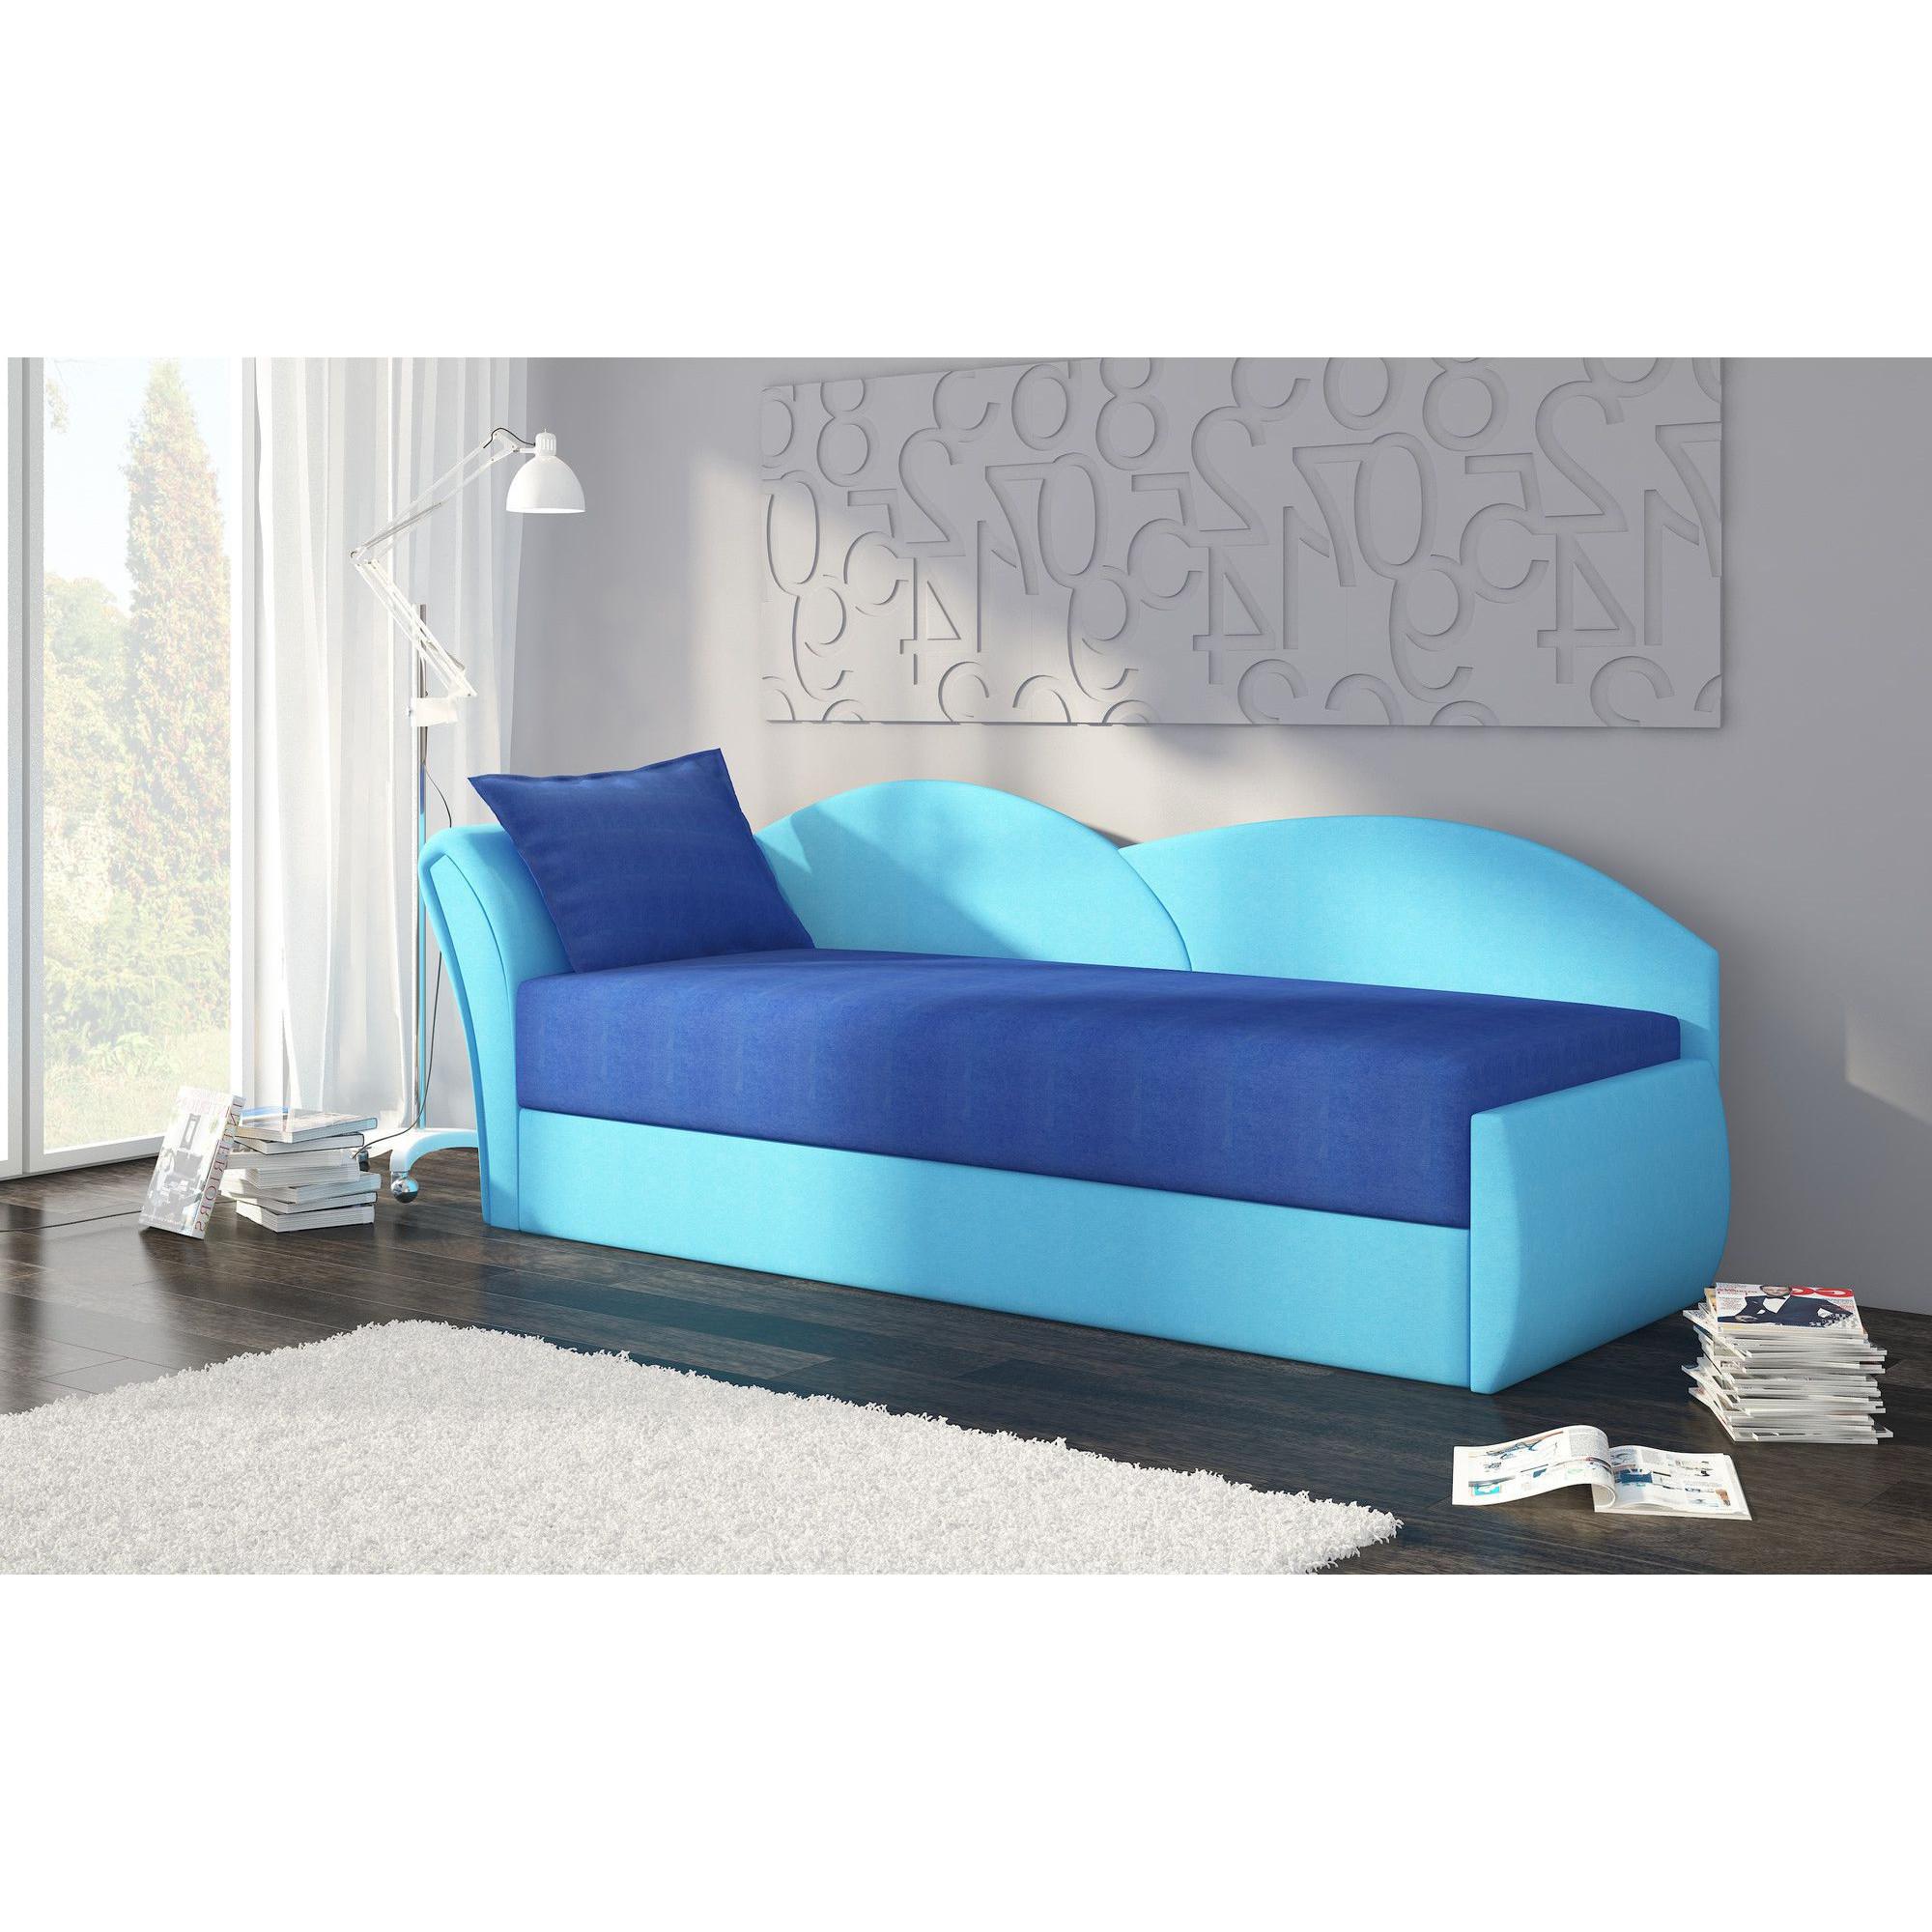 Canapé convertible 2 places en tissu bleu ciel avec coffre